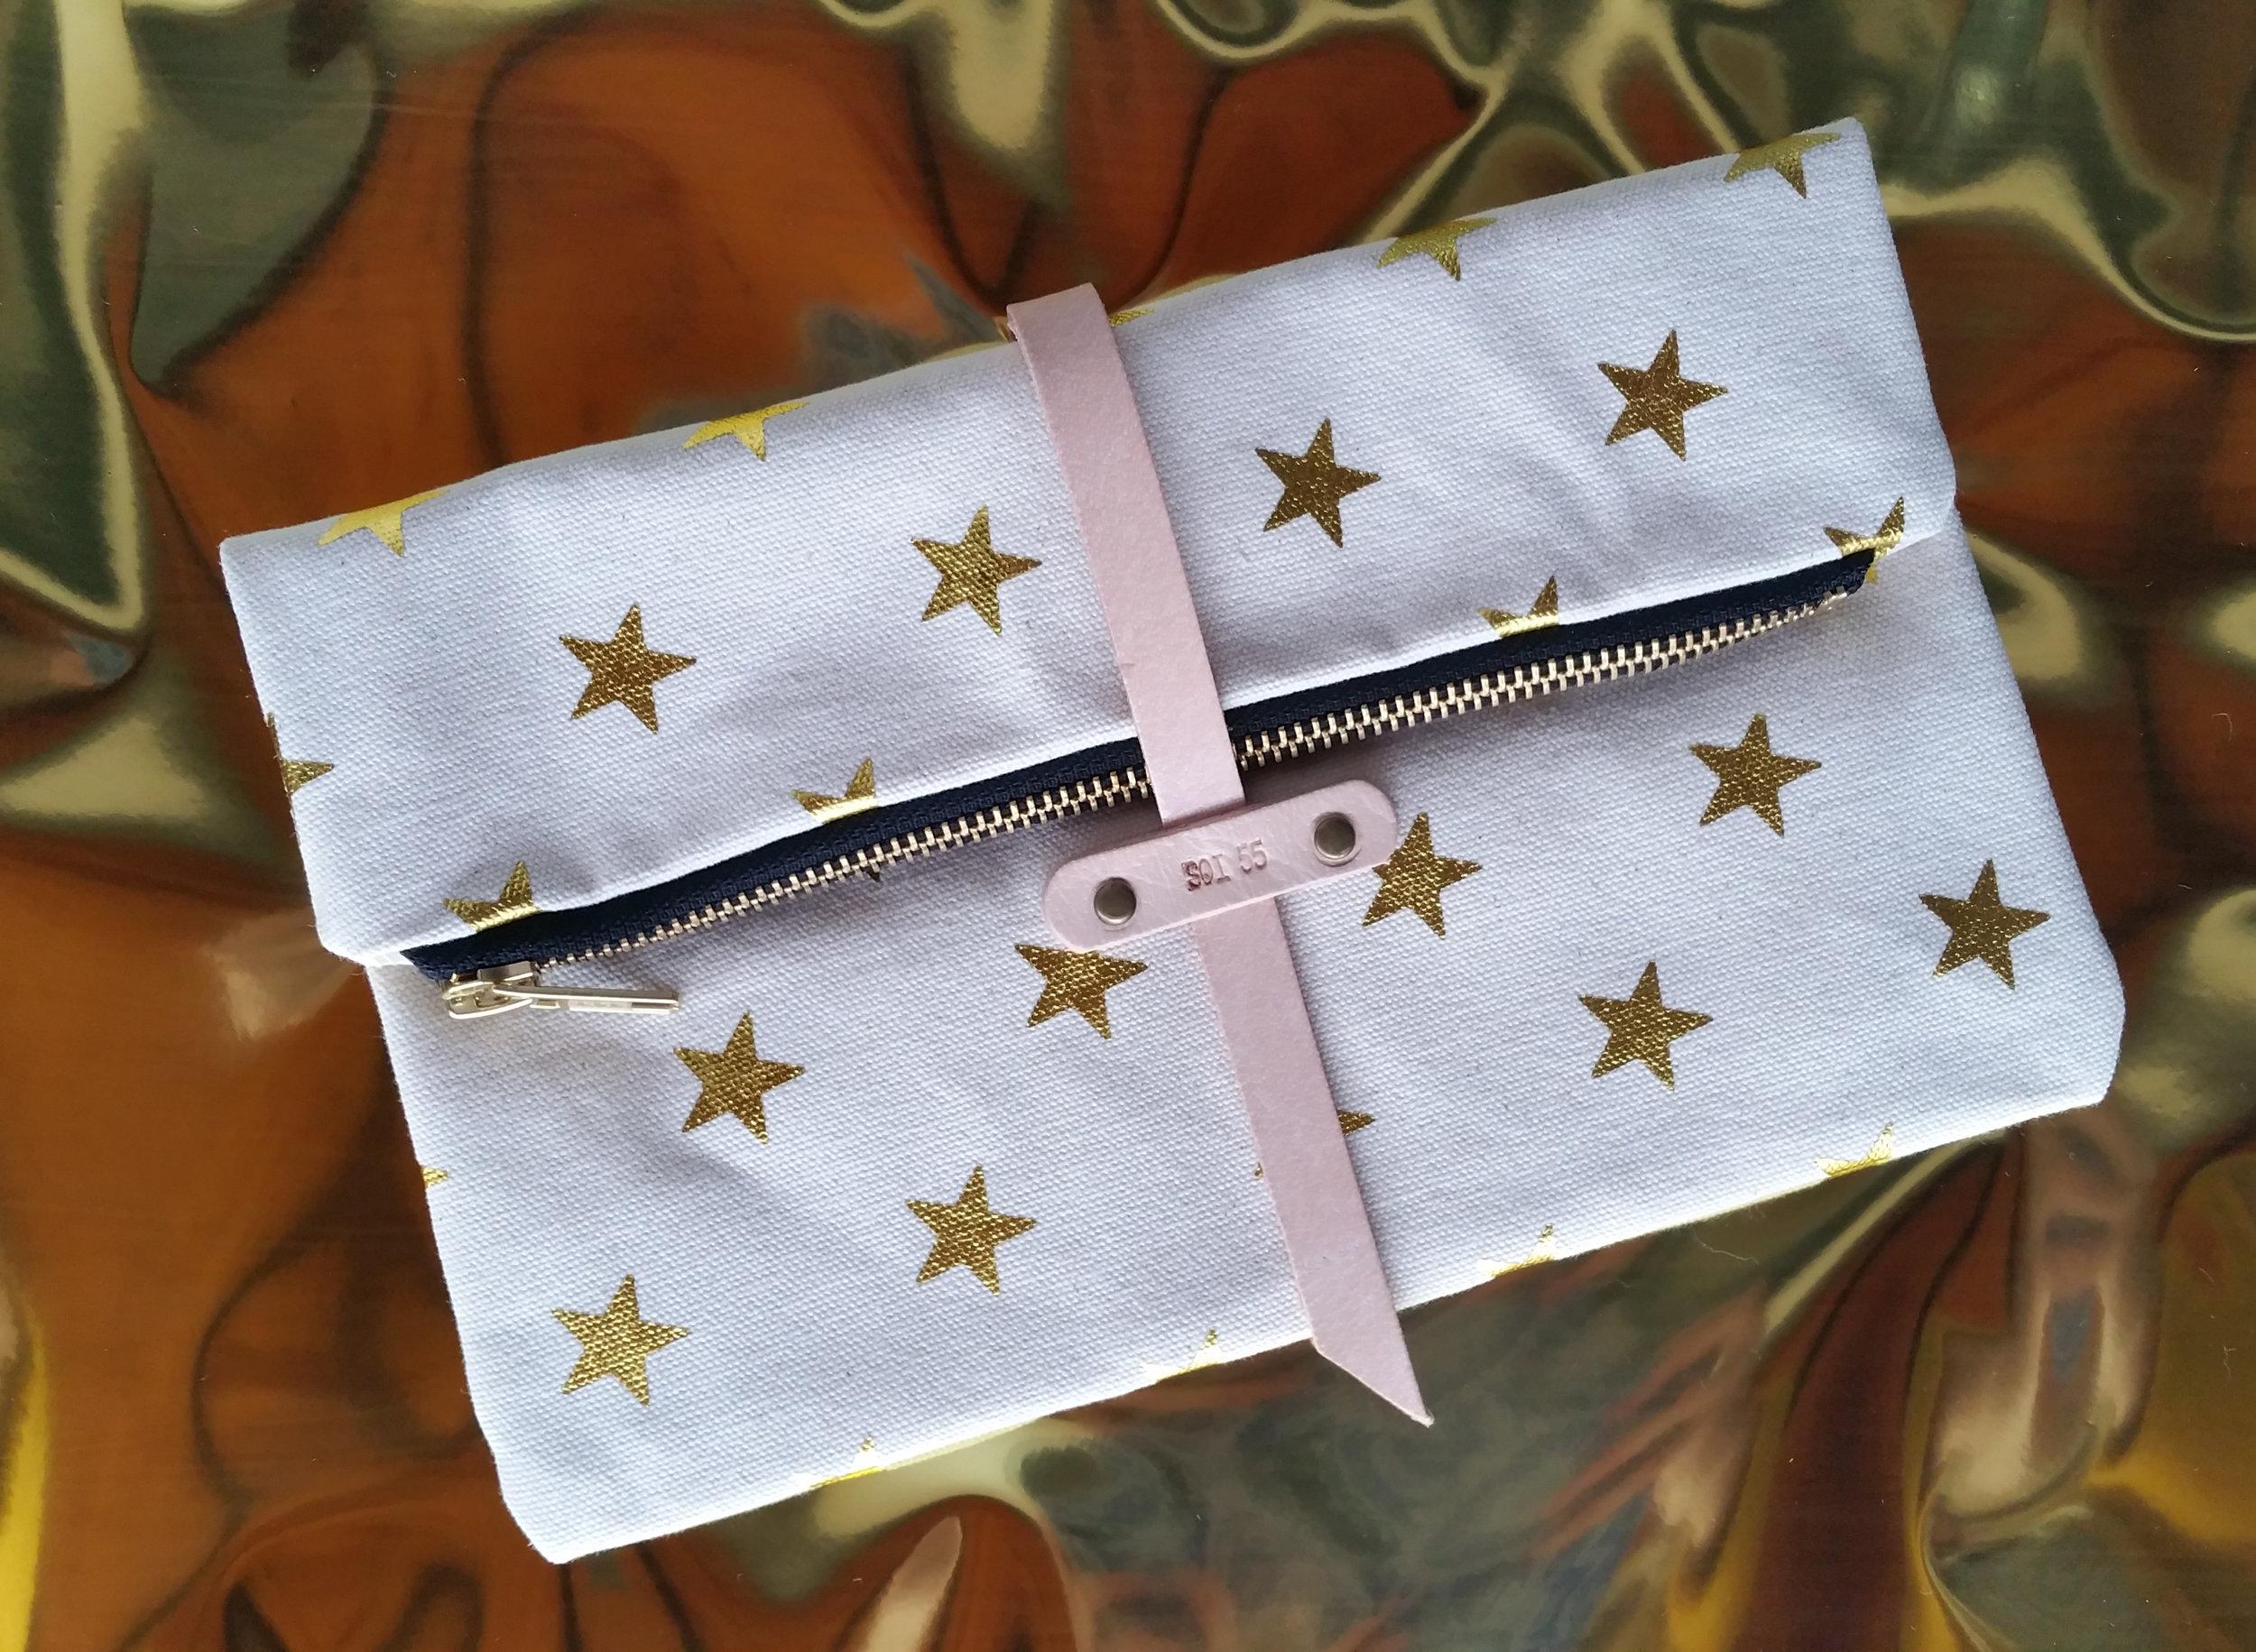 soi 55 lifestyle star trend - como foldover clutch purse in metallic gold star print